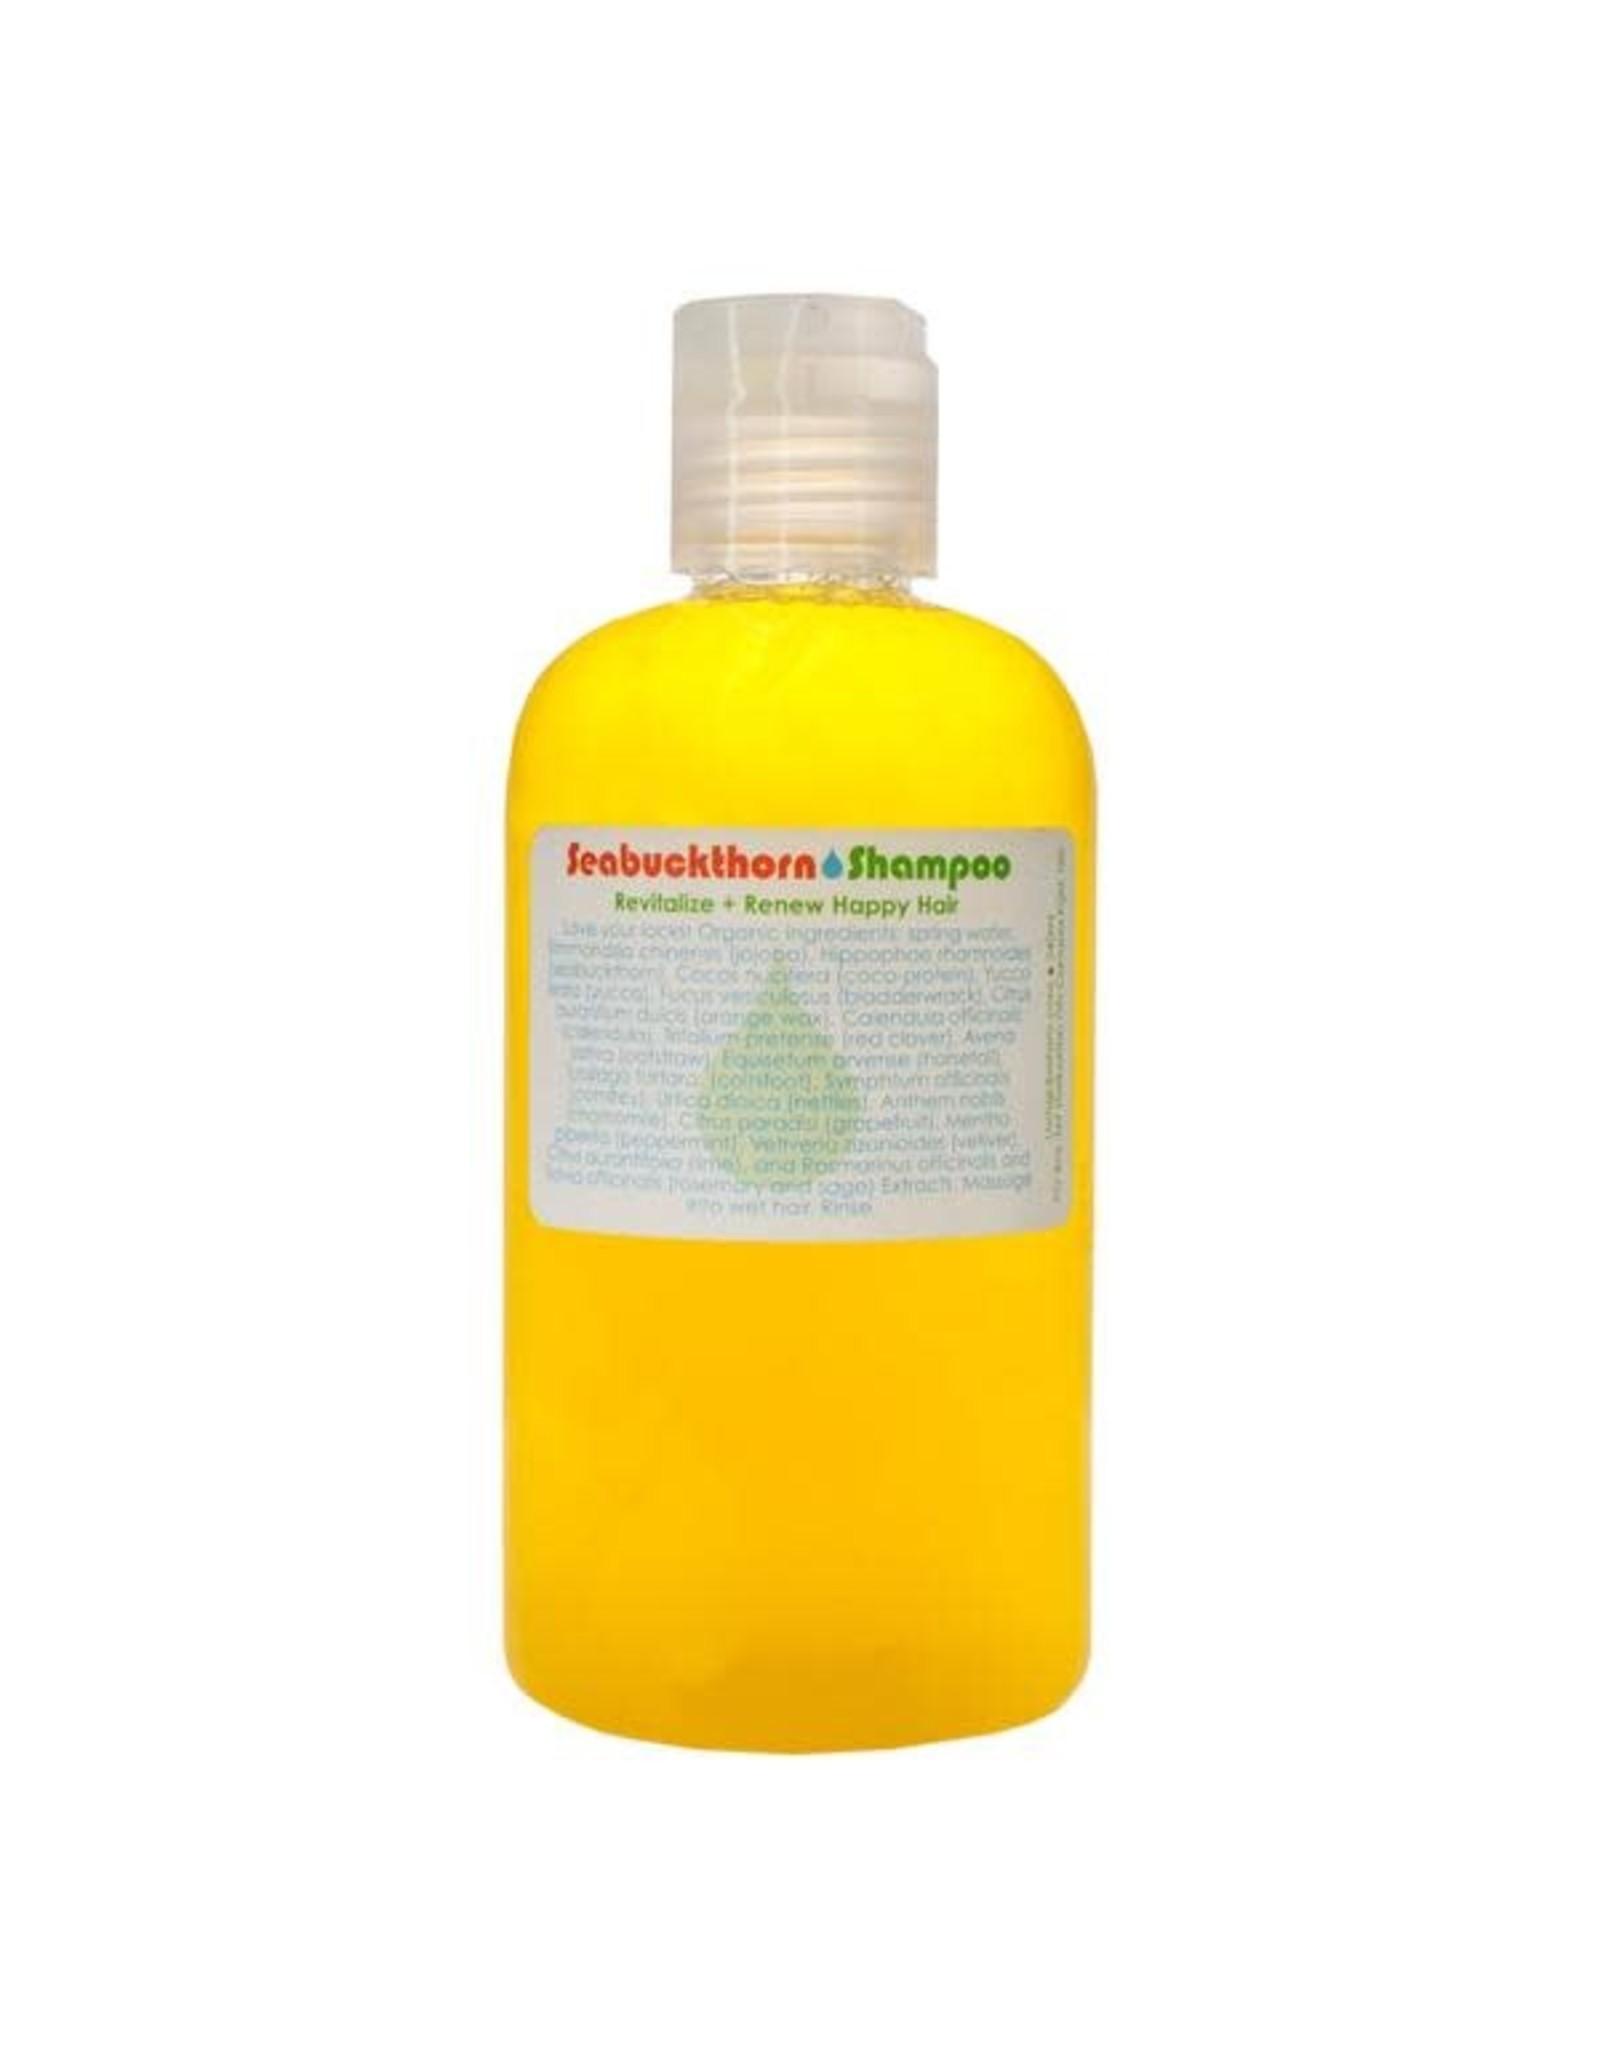 Living Libations Seabuckthorn Shampoo 240ml